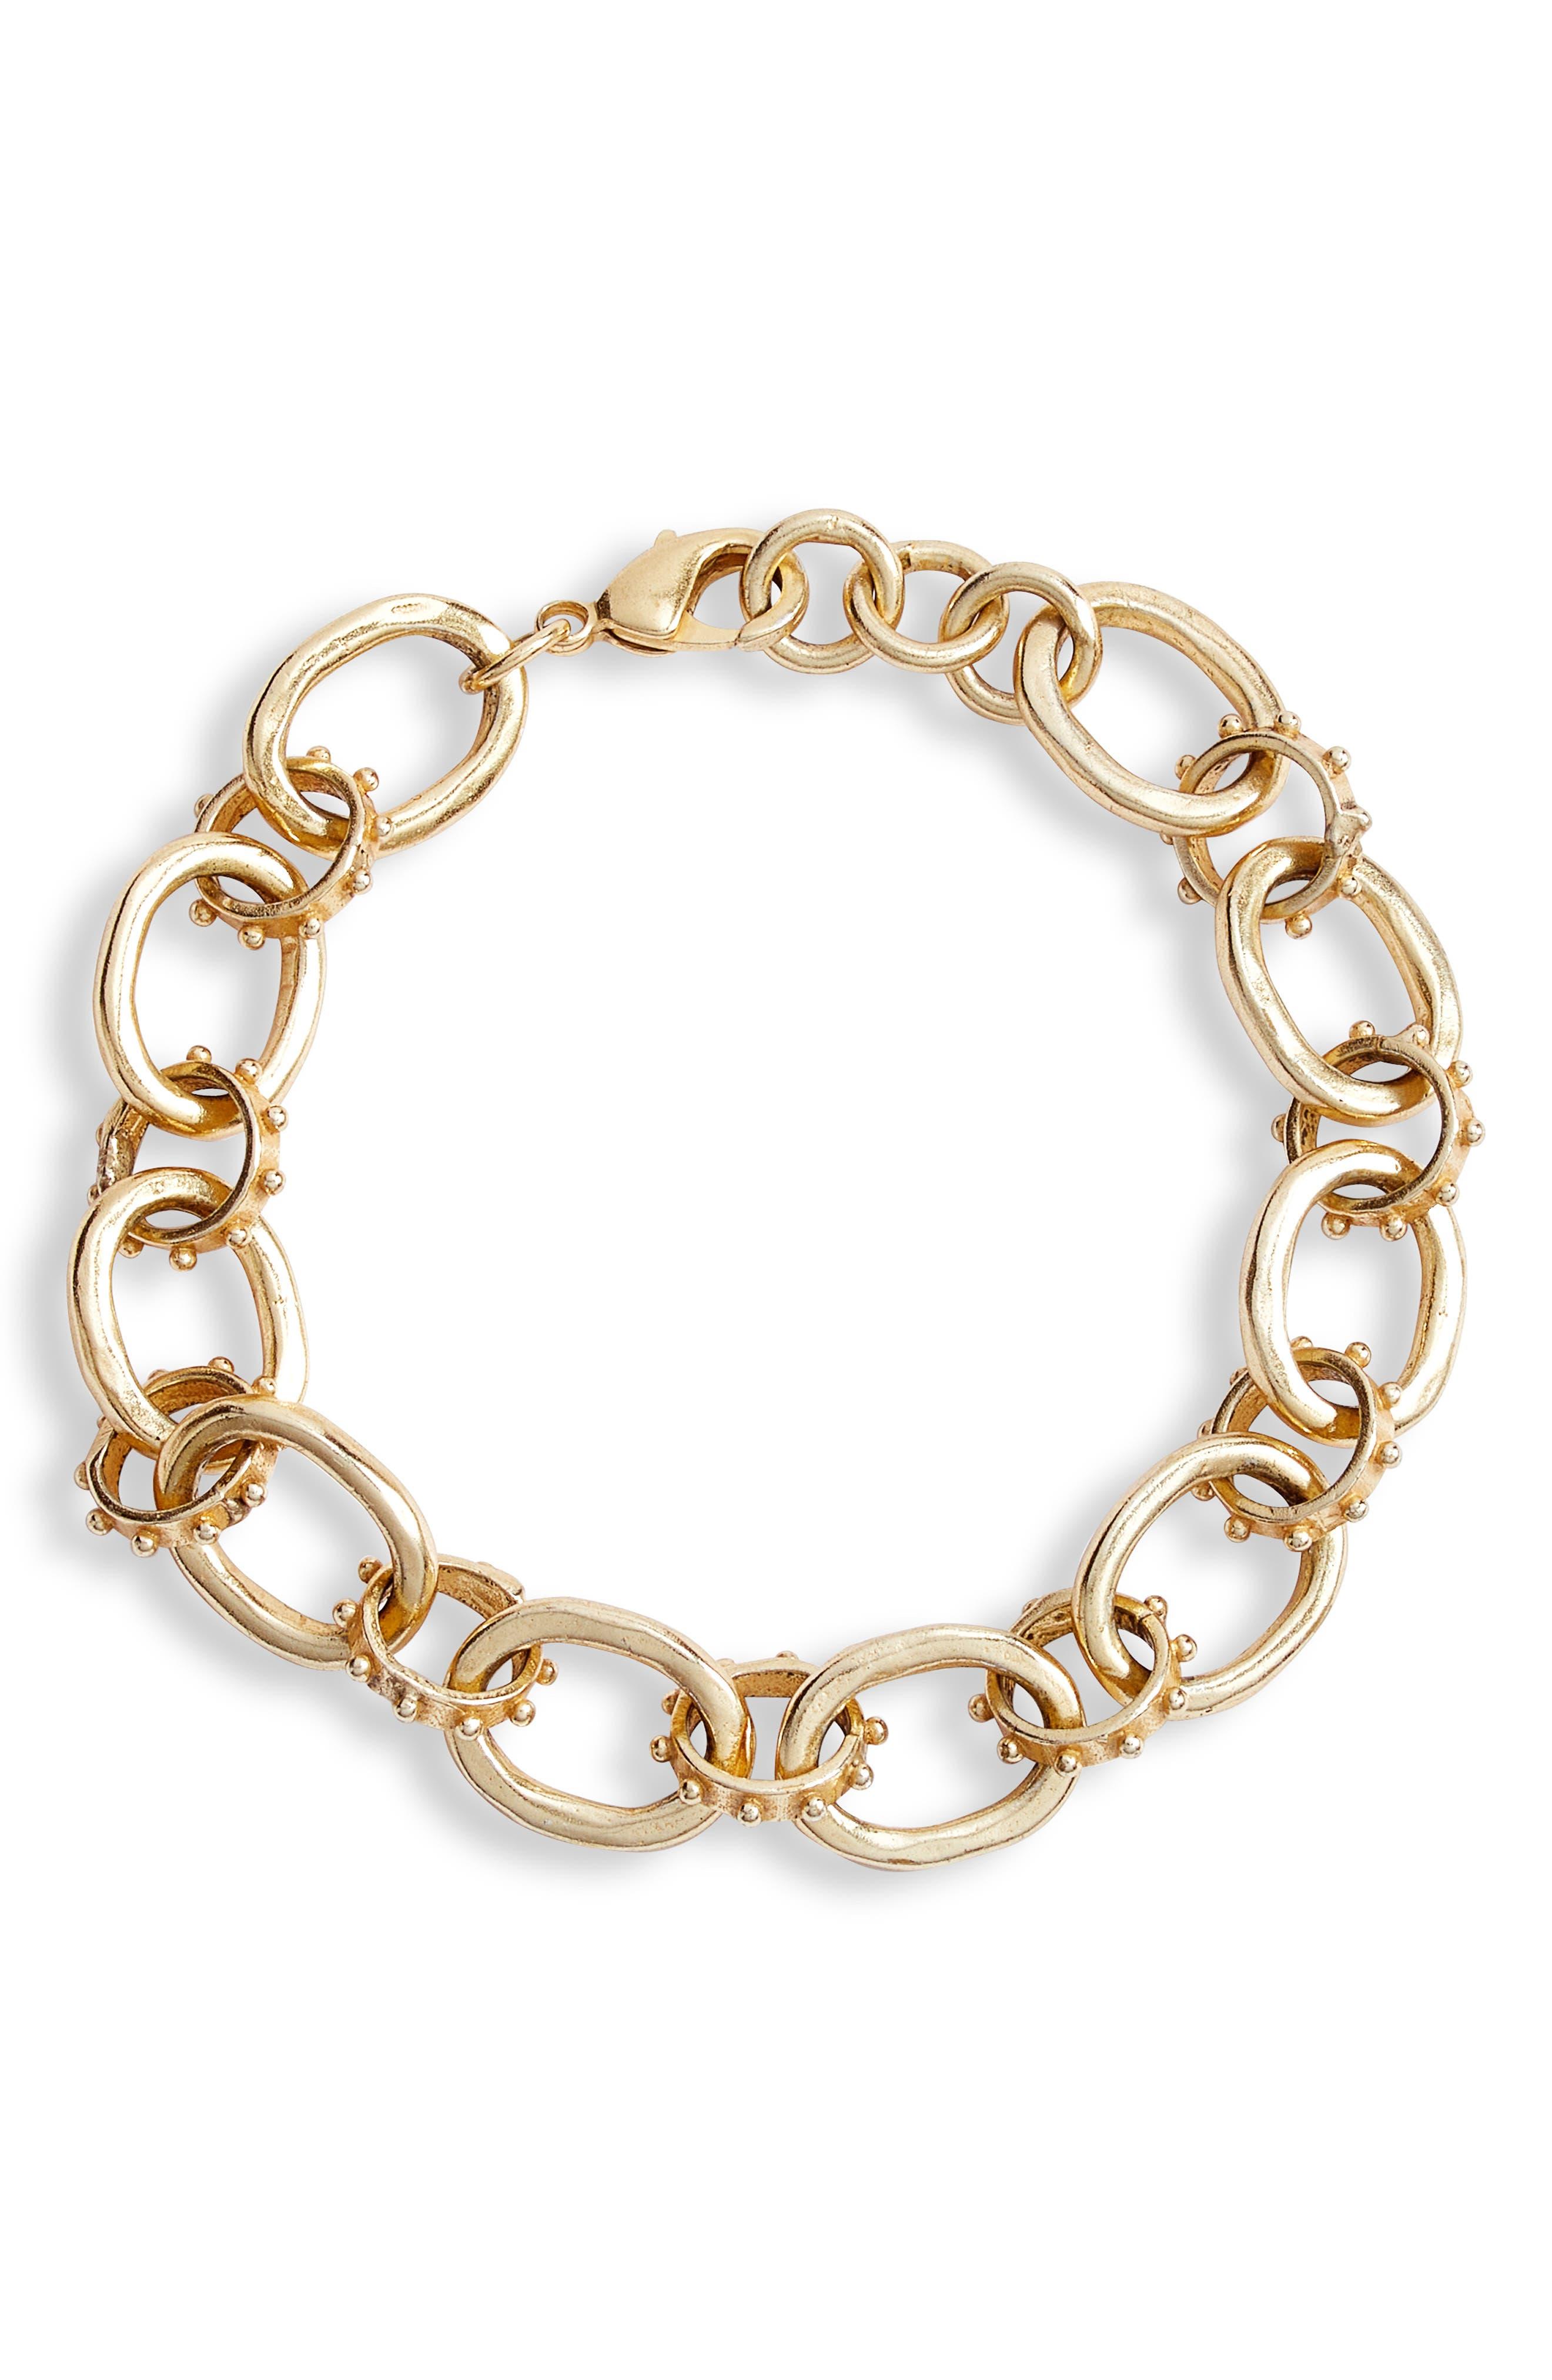 Collections by Joya Ada Sterling Silver Link Bracelet in Gold at Nordstrom